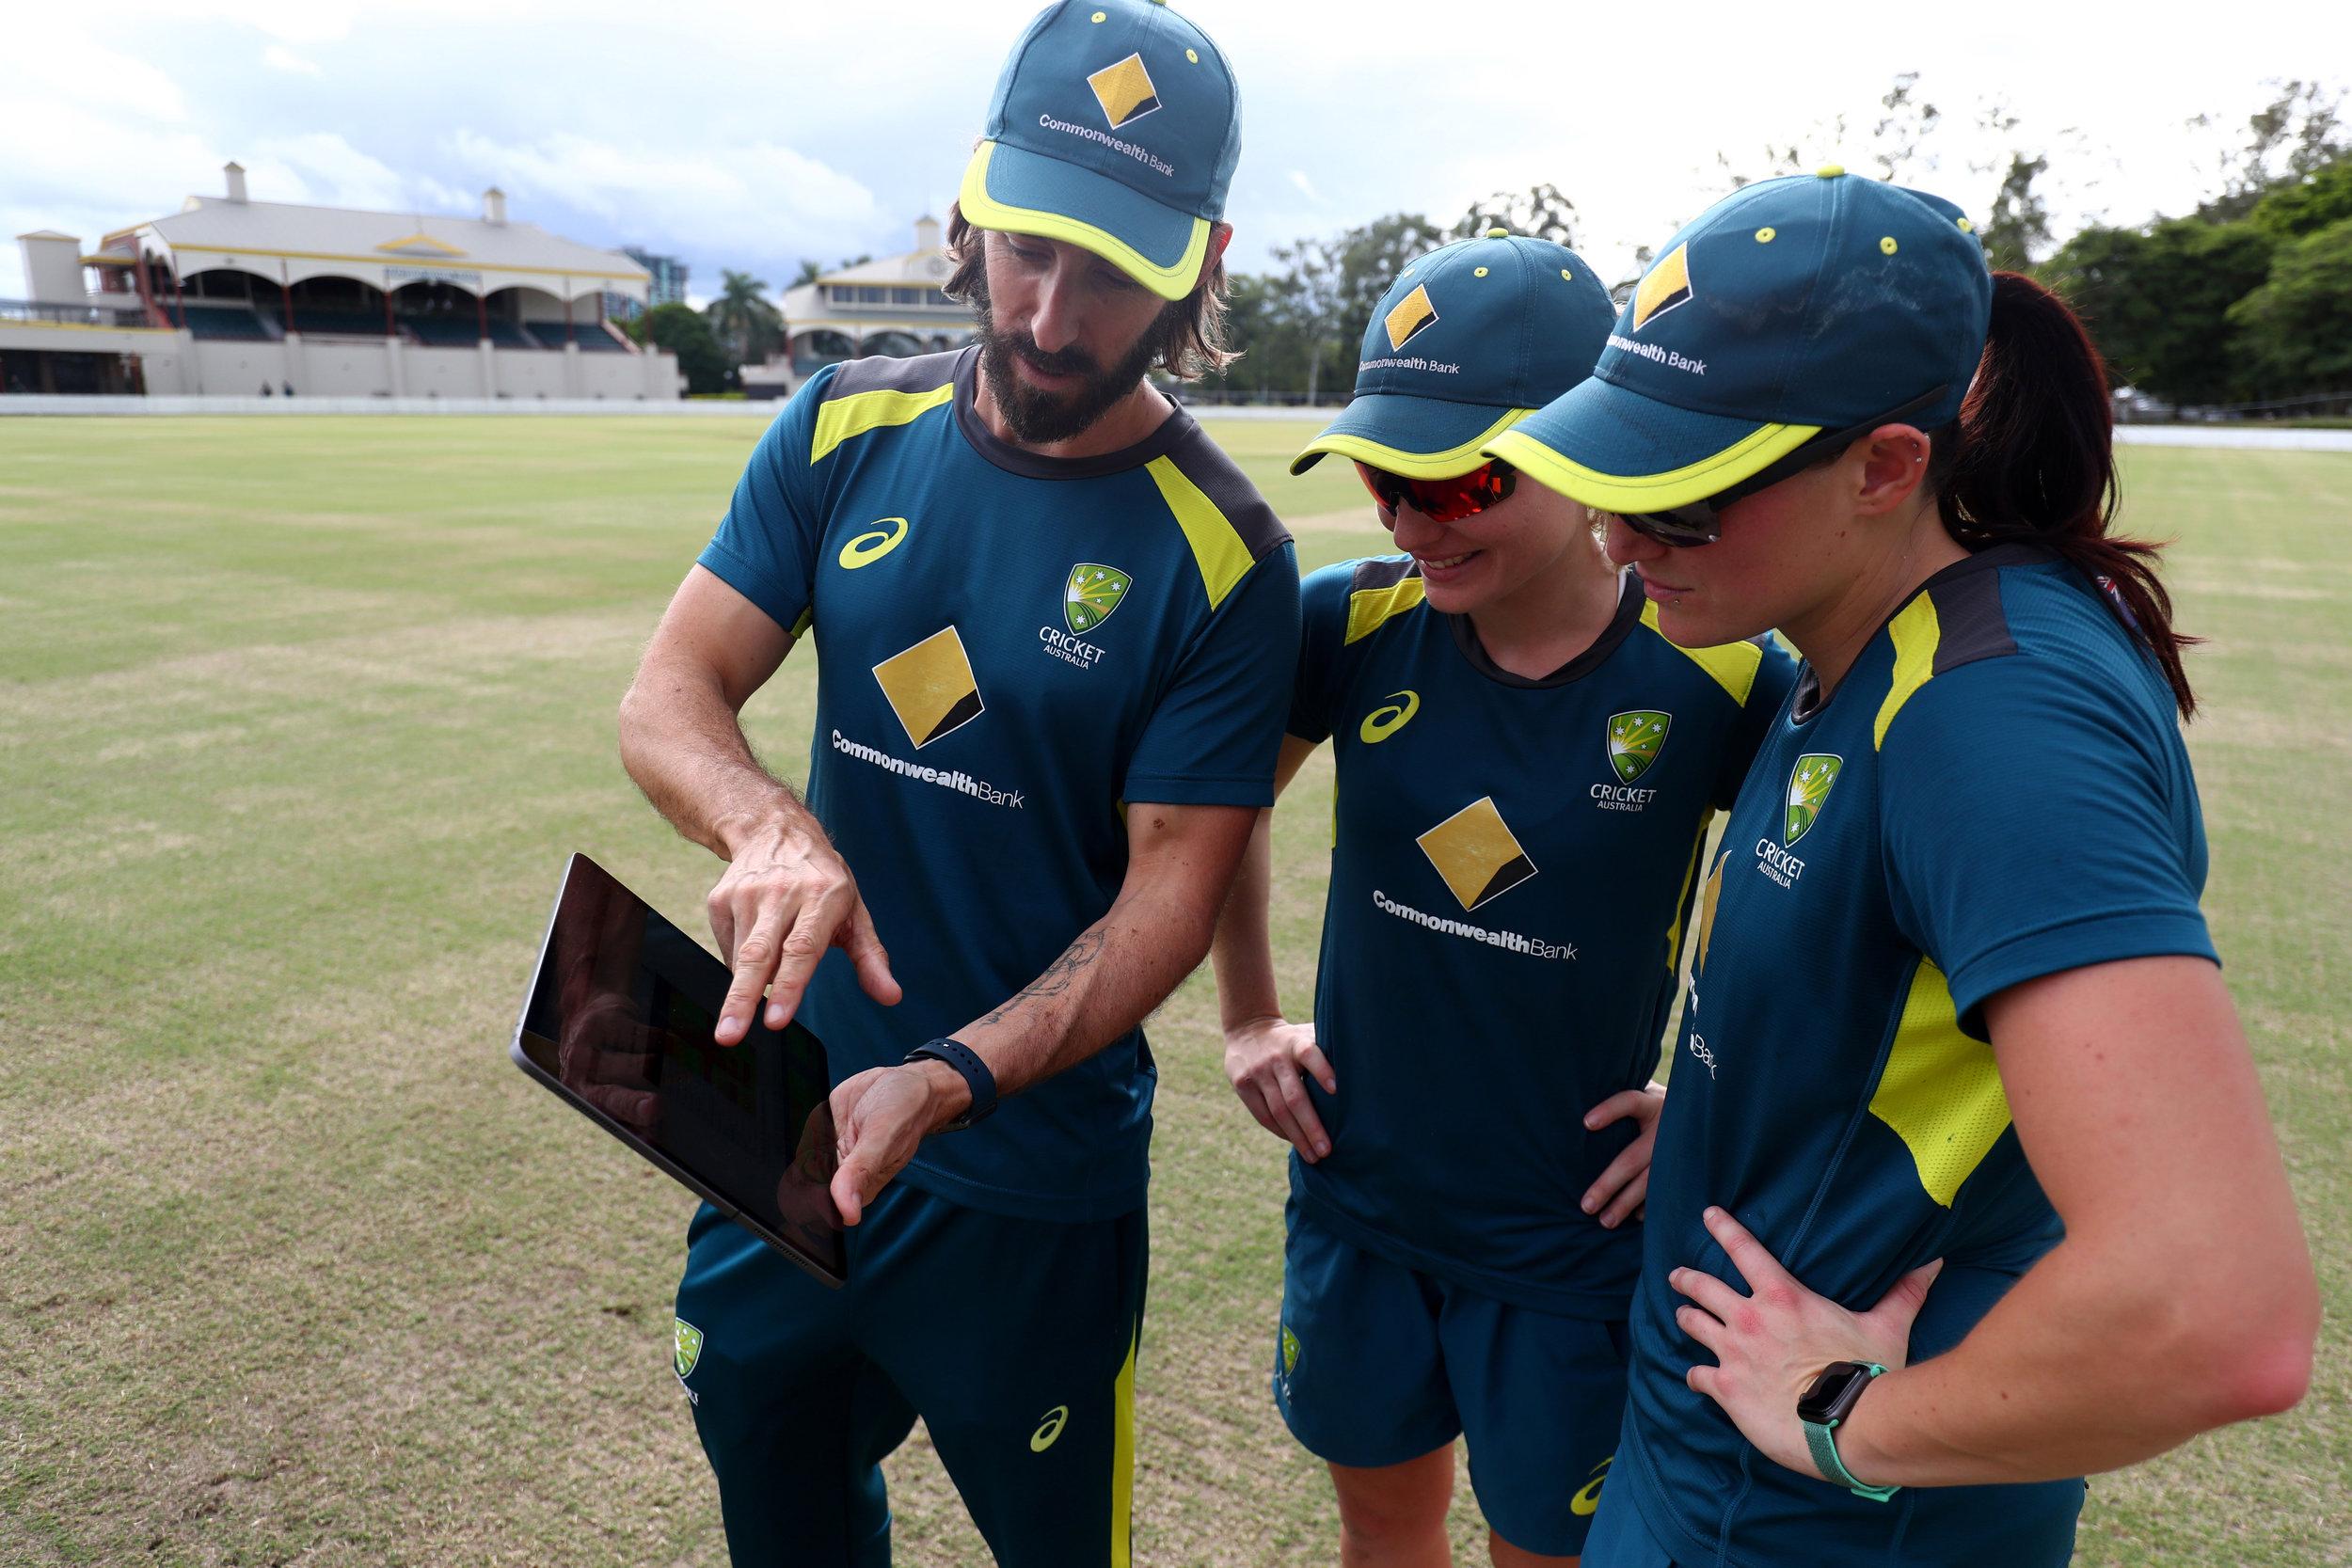 Australia-womens-cricket-team-uses-Apple-Watch-coach-with-players-062319.jpg